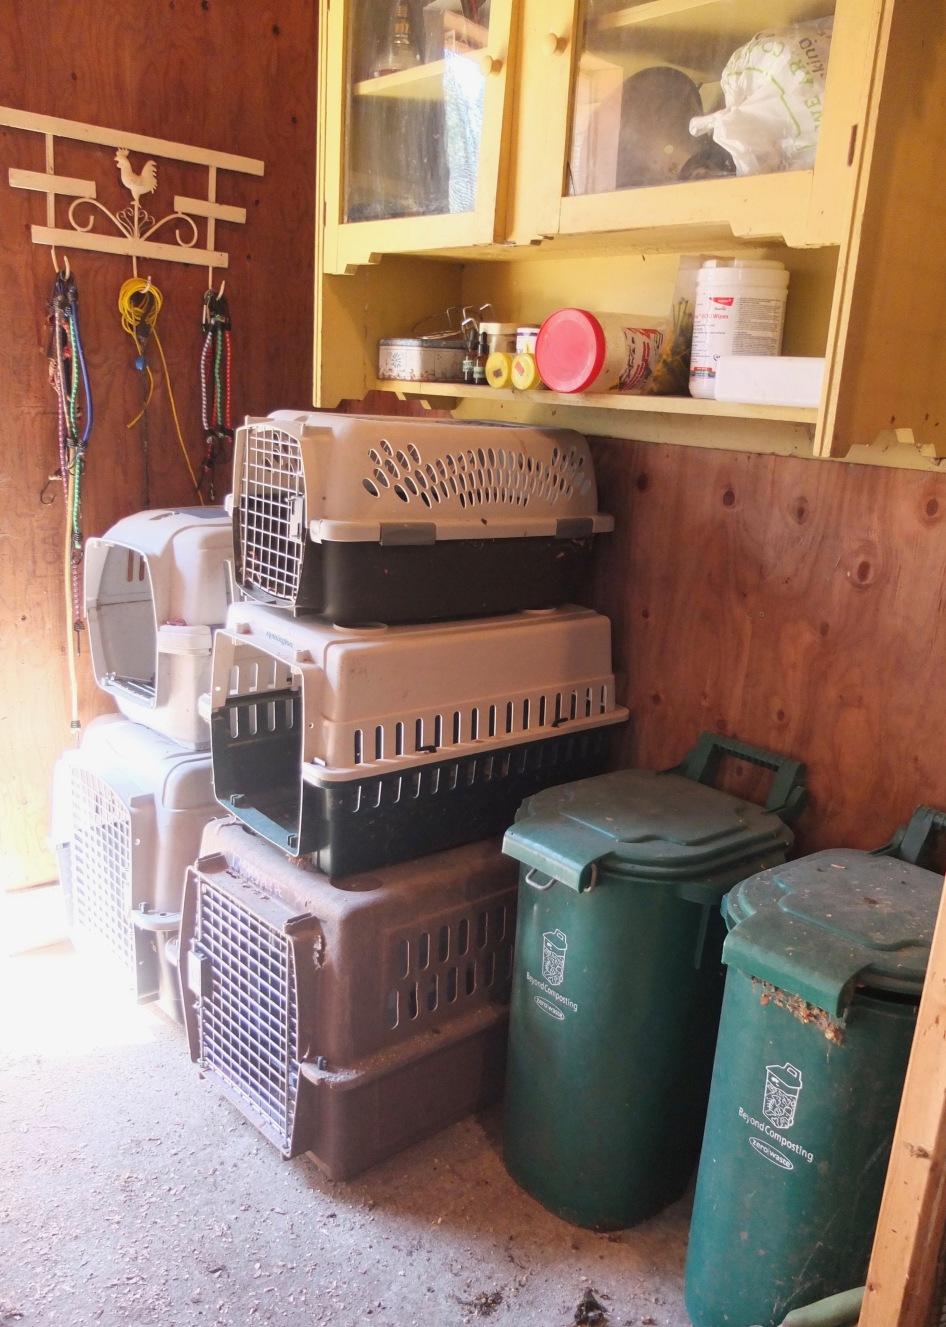 Clean Crates & Feed Bins